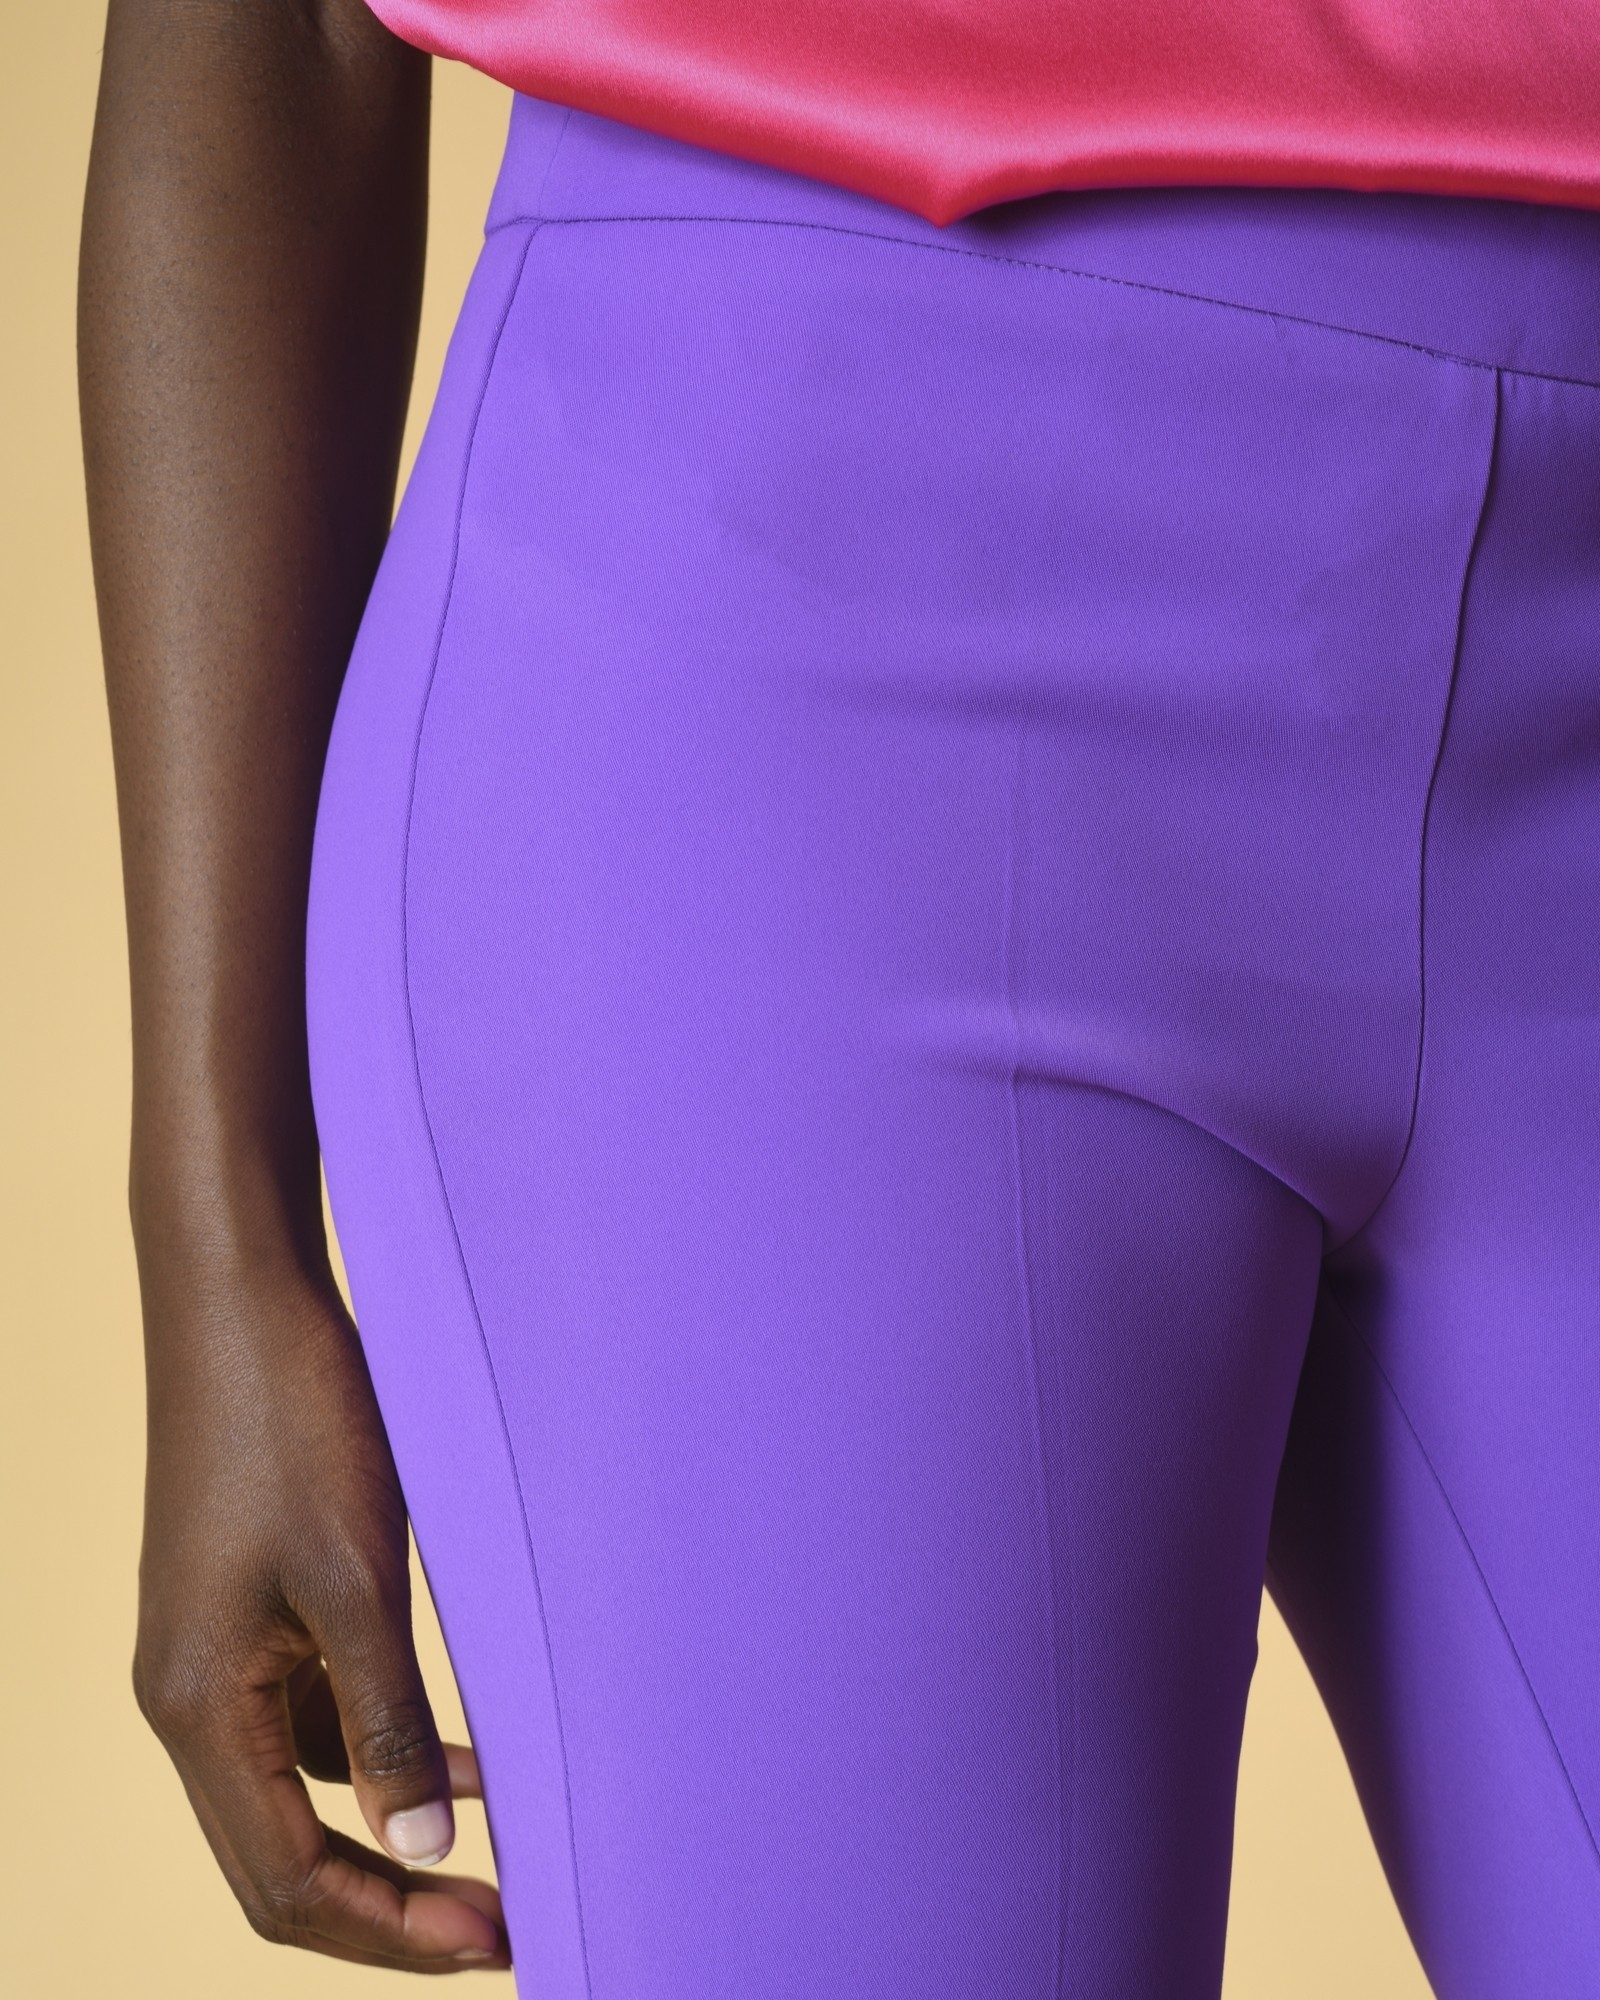 Pantalon violet Space Simona Corsellini